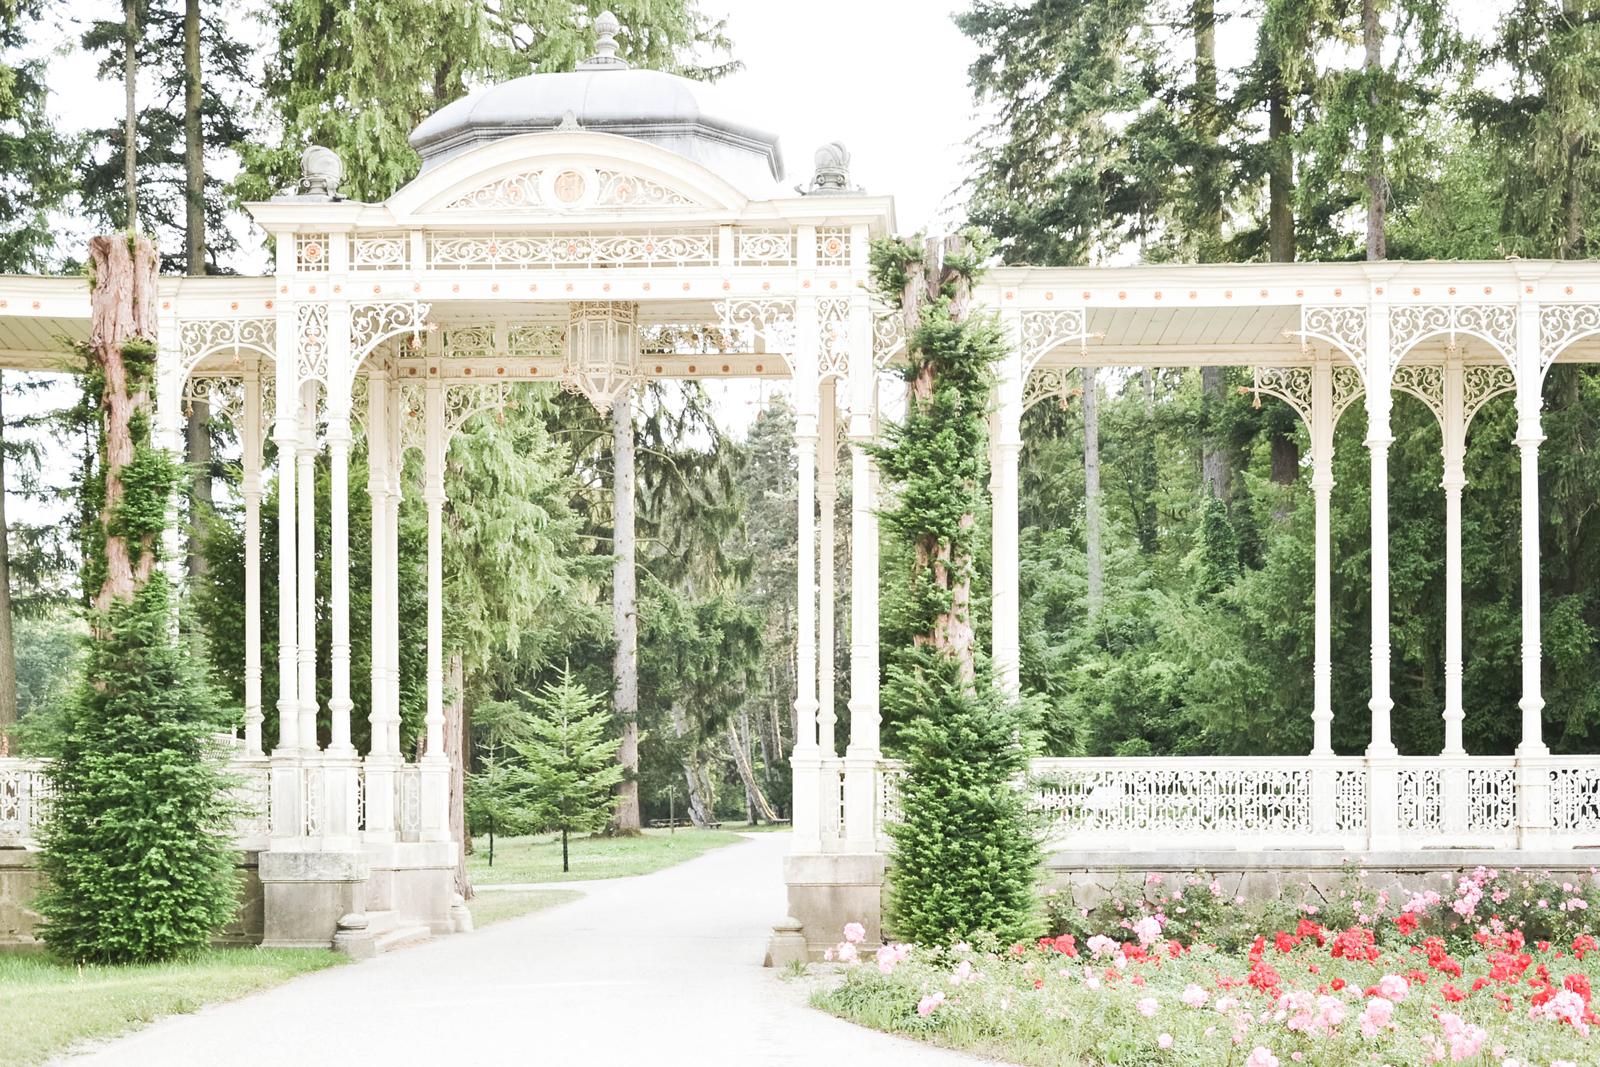 Lainzer-Tiergarten-Vienna-Hermesvilla-epepa-hiddengem